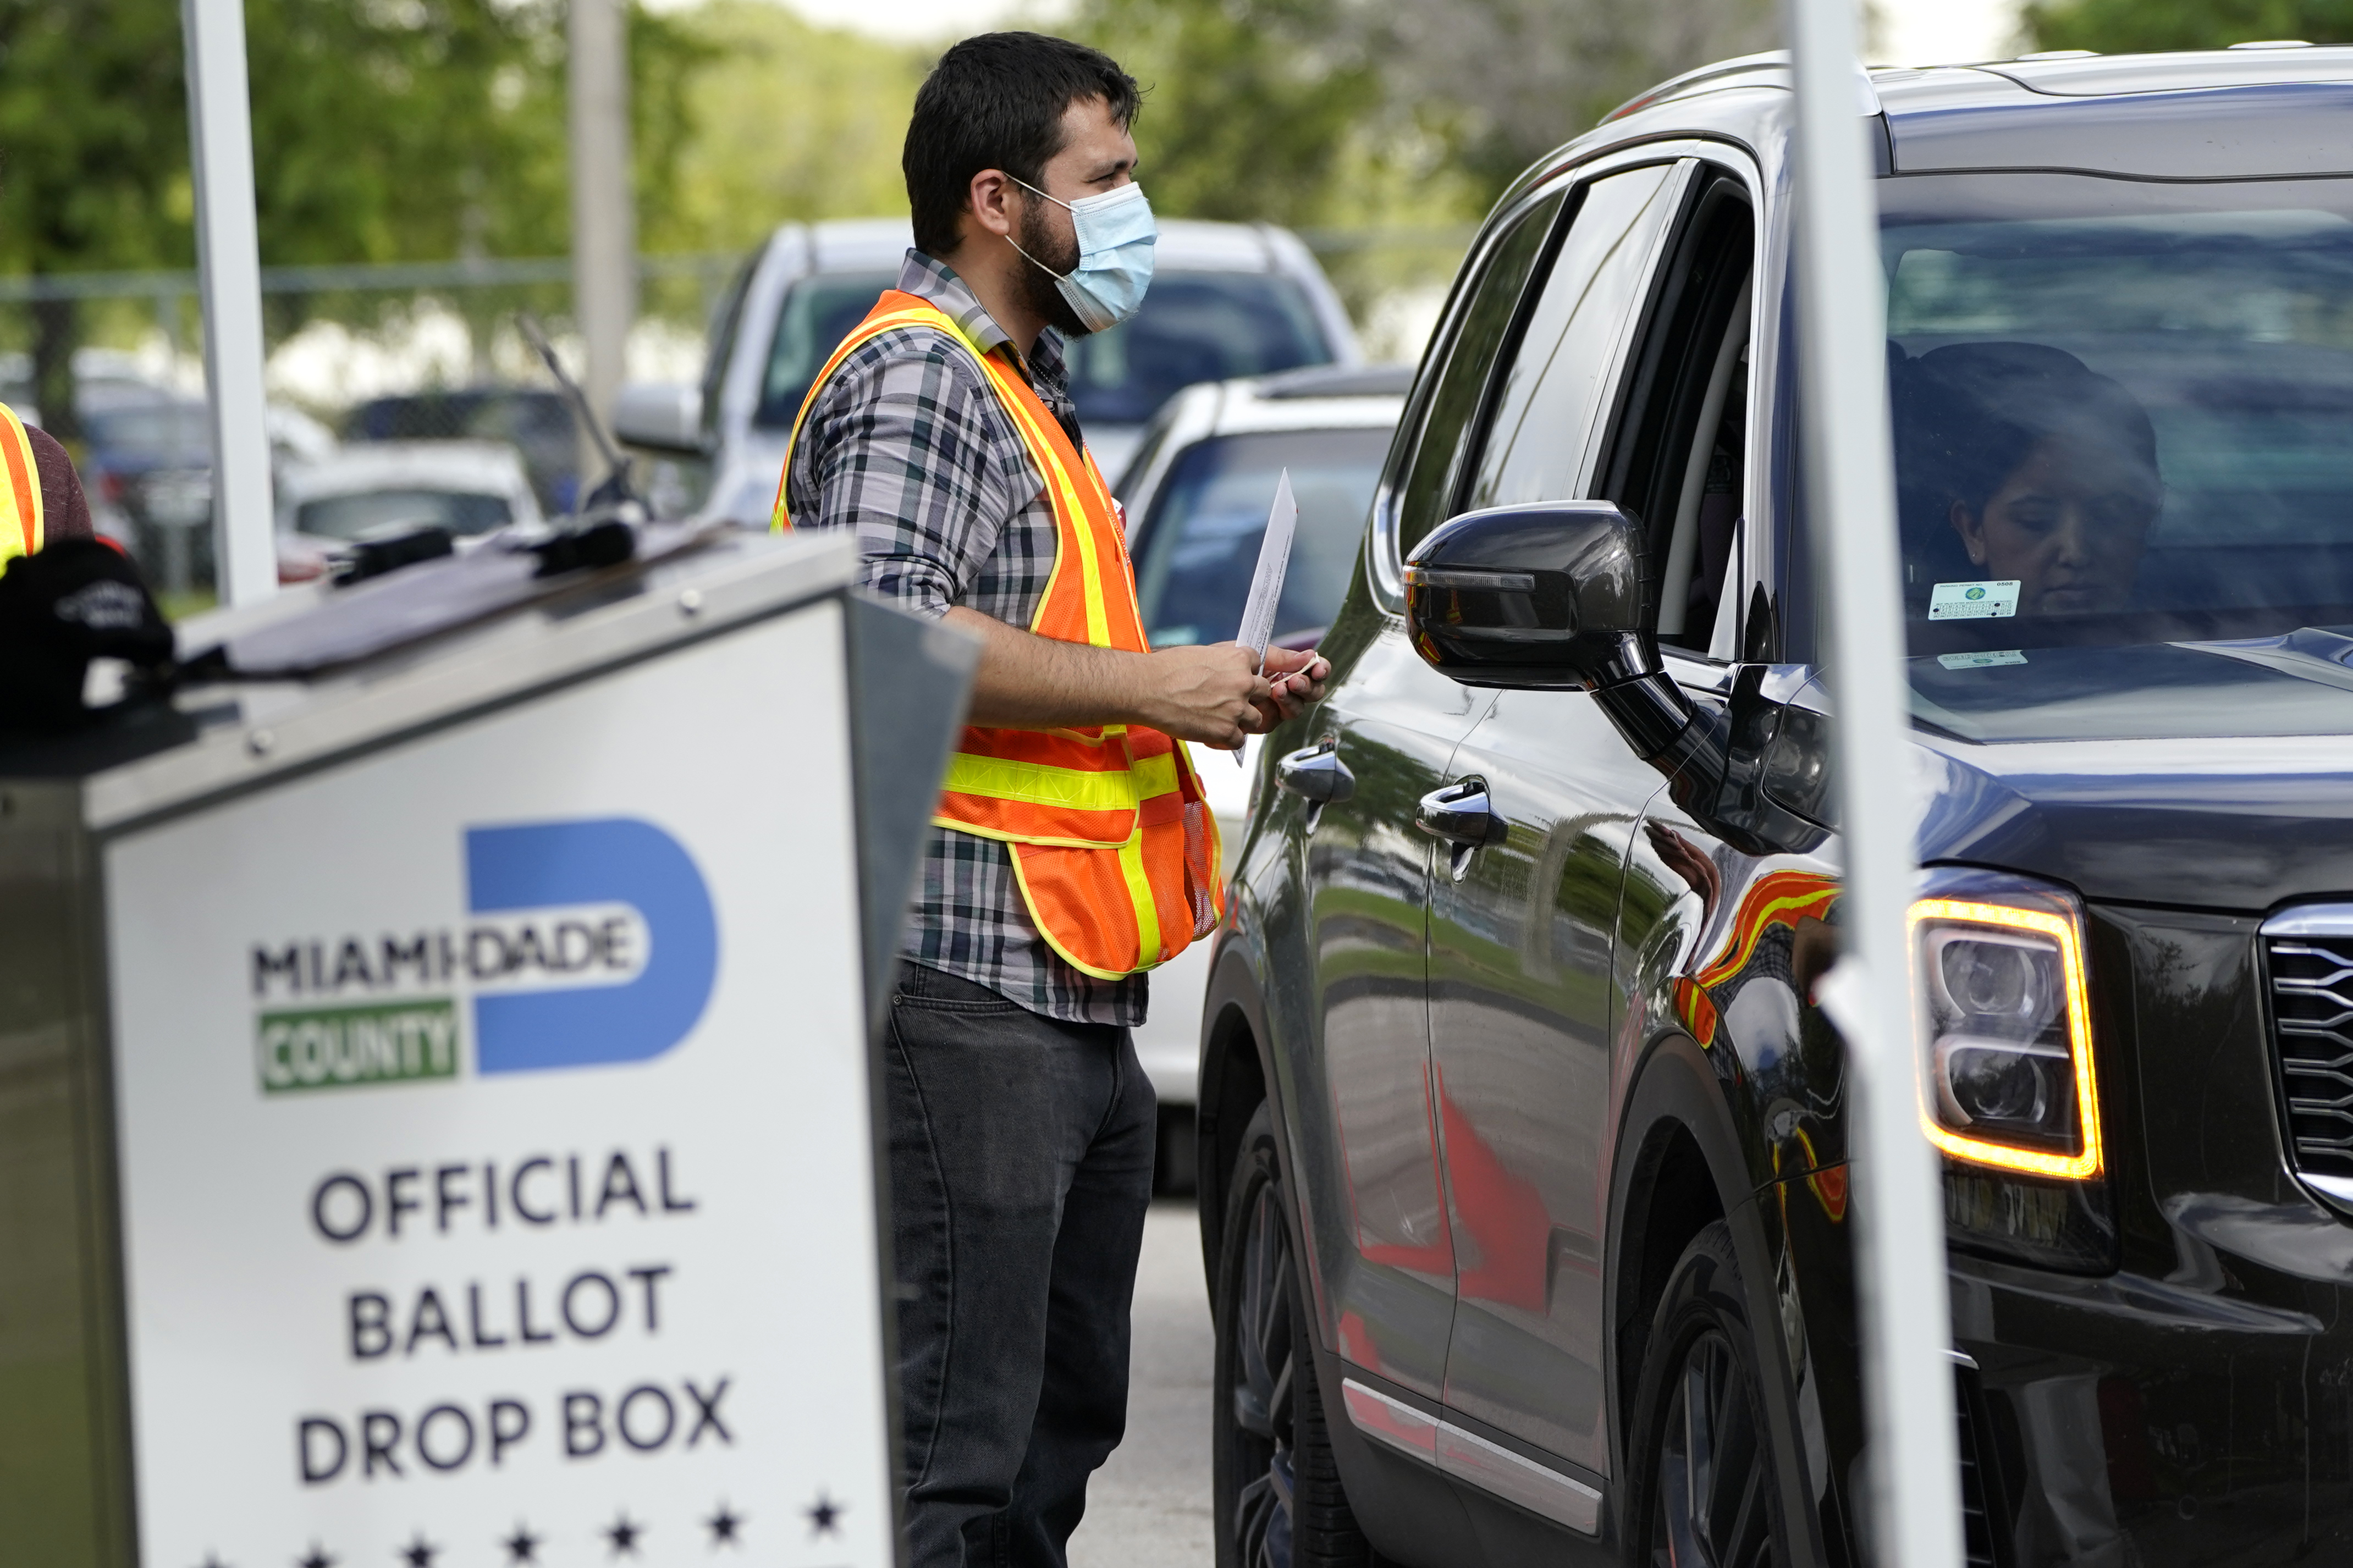 Voter Registrations Of Desantis Michael Jordan And Lebron James Accessed By Naples Man Fdle Says